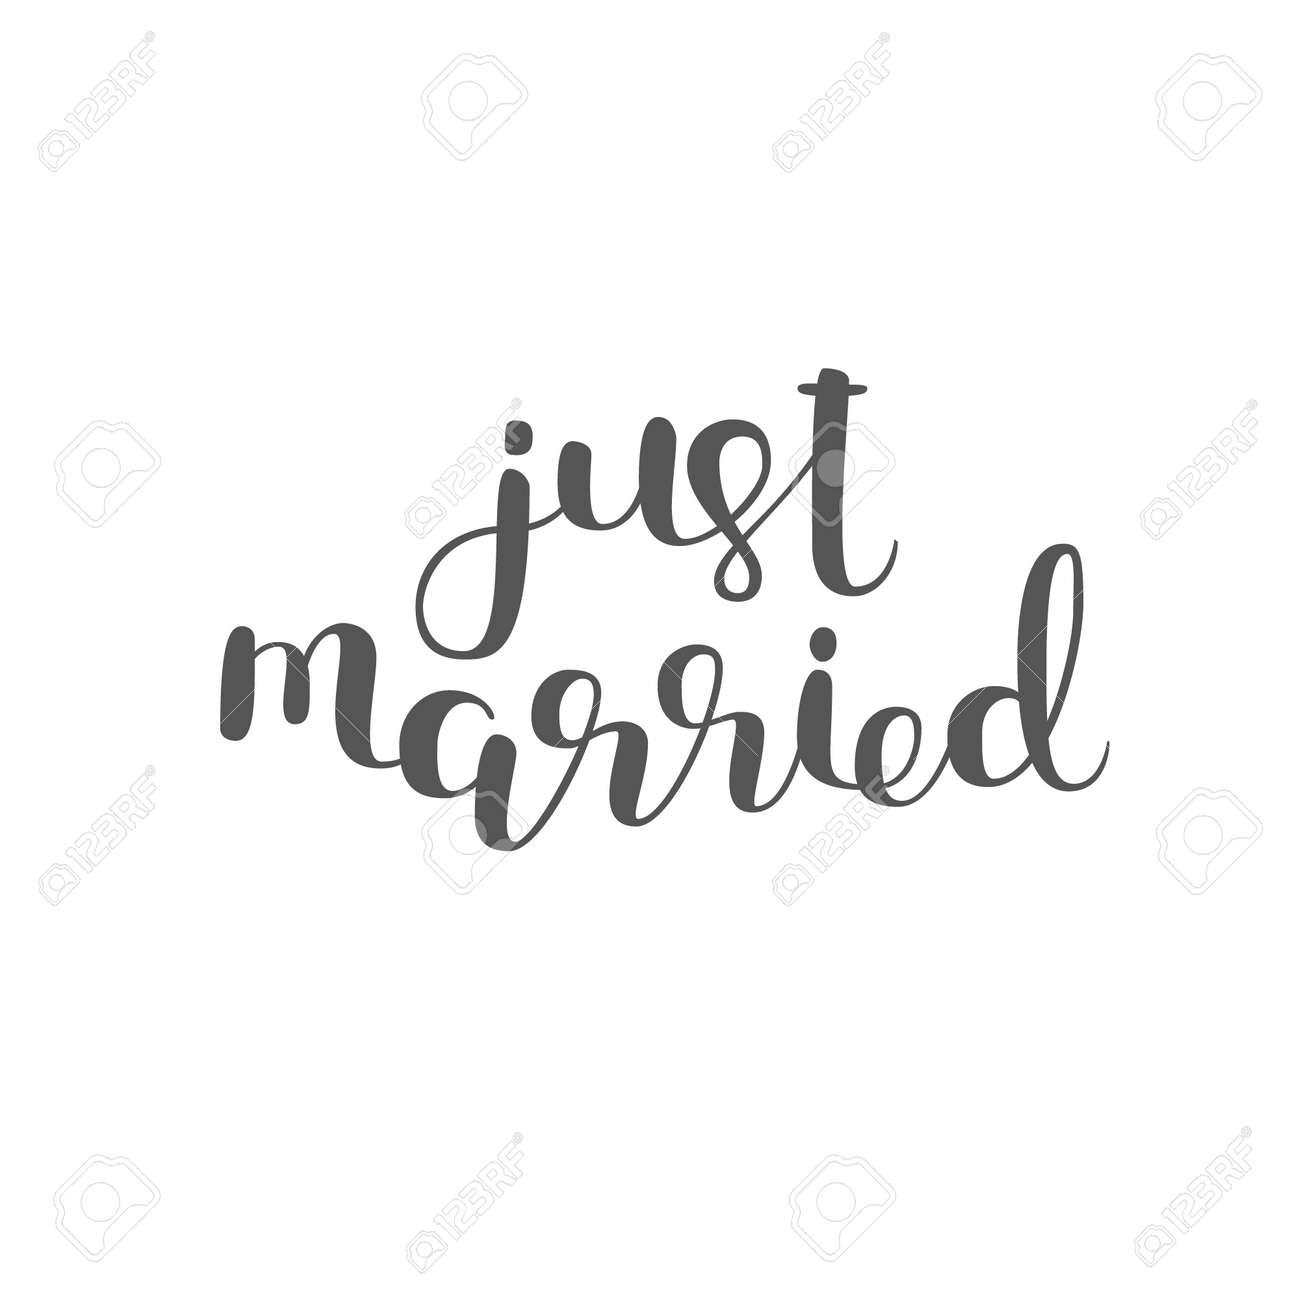 Frisch Verheiratet Pinselbeschriftung Moderne Kalligraphie Kann